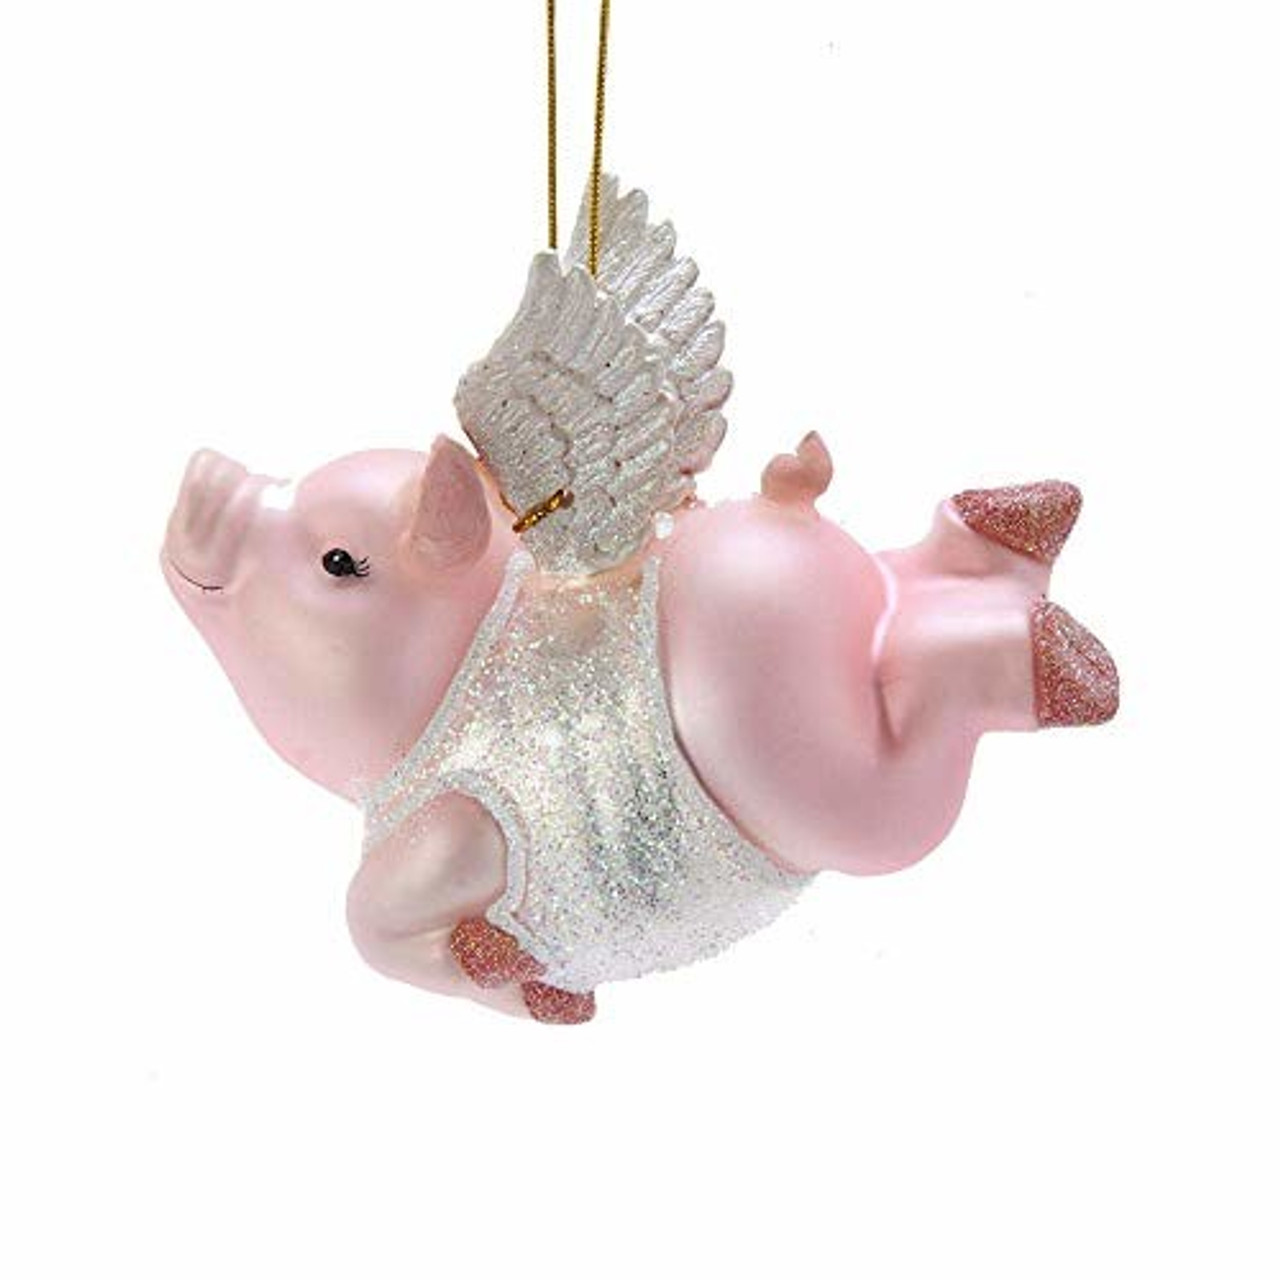 Kurt Adler Nb1456 Noble Gems Flying Pig Glass Ornament Esbenshades